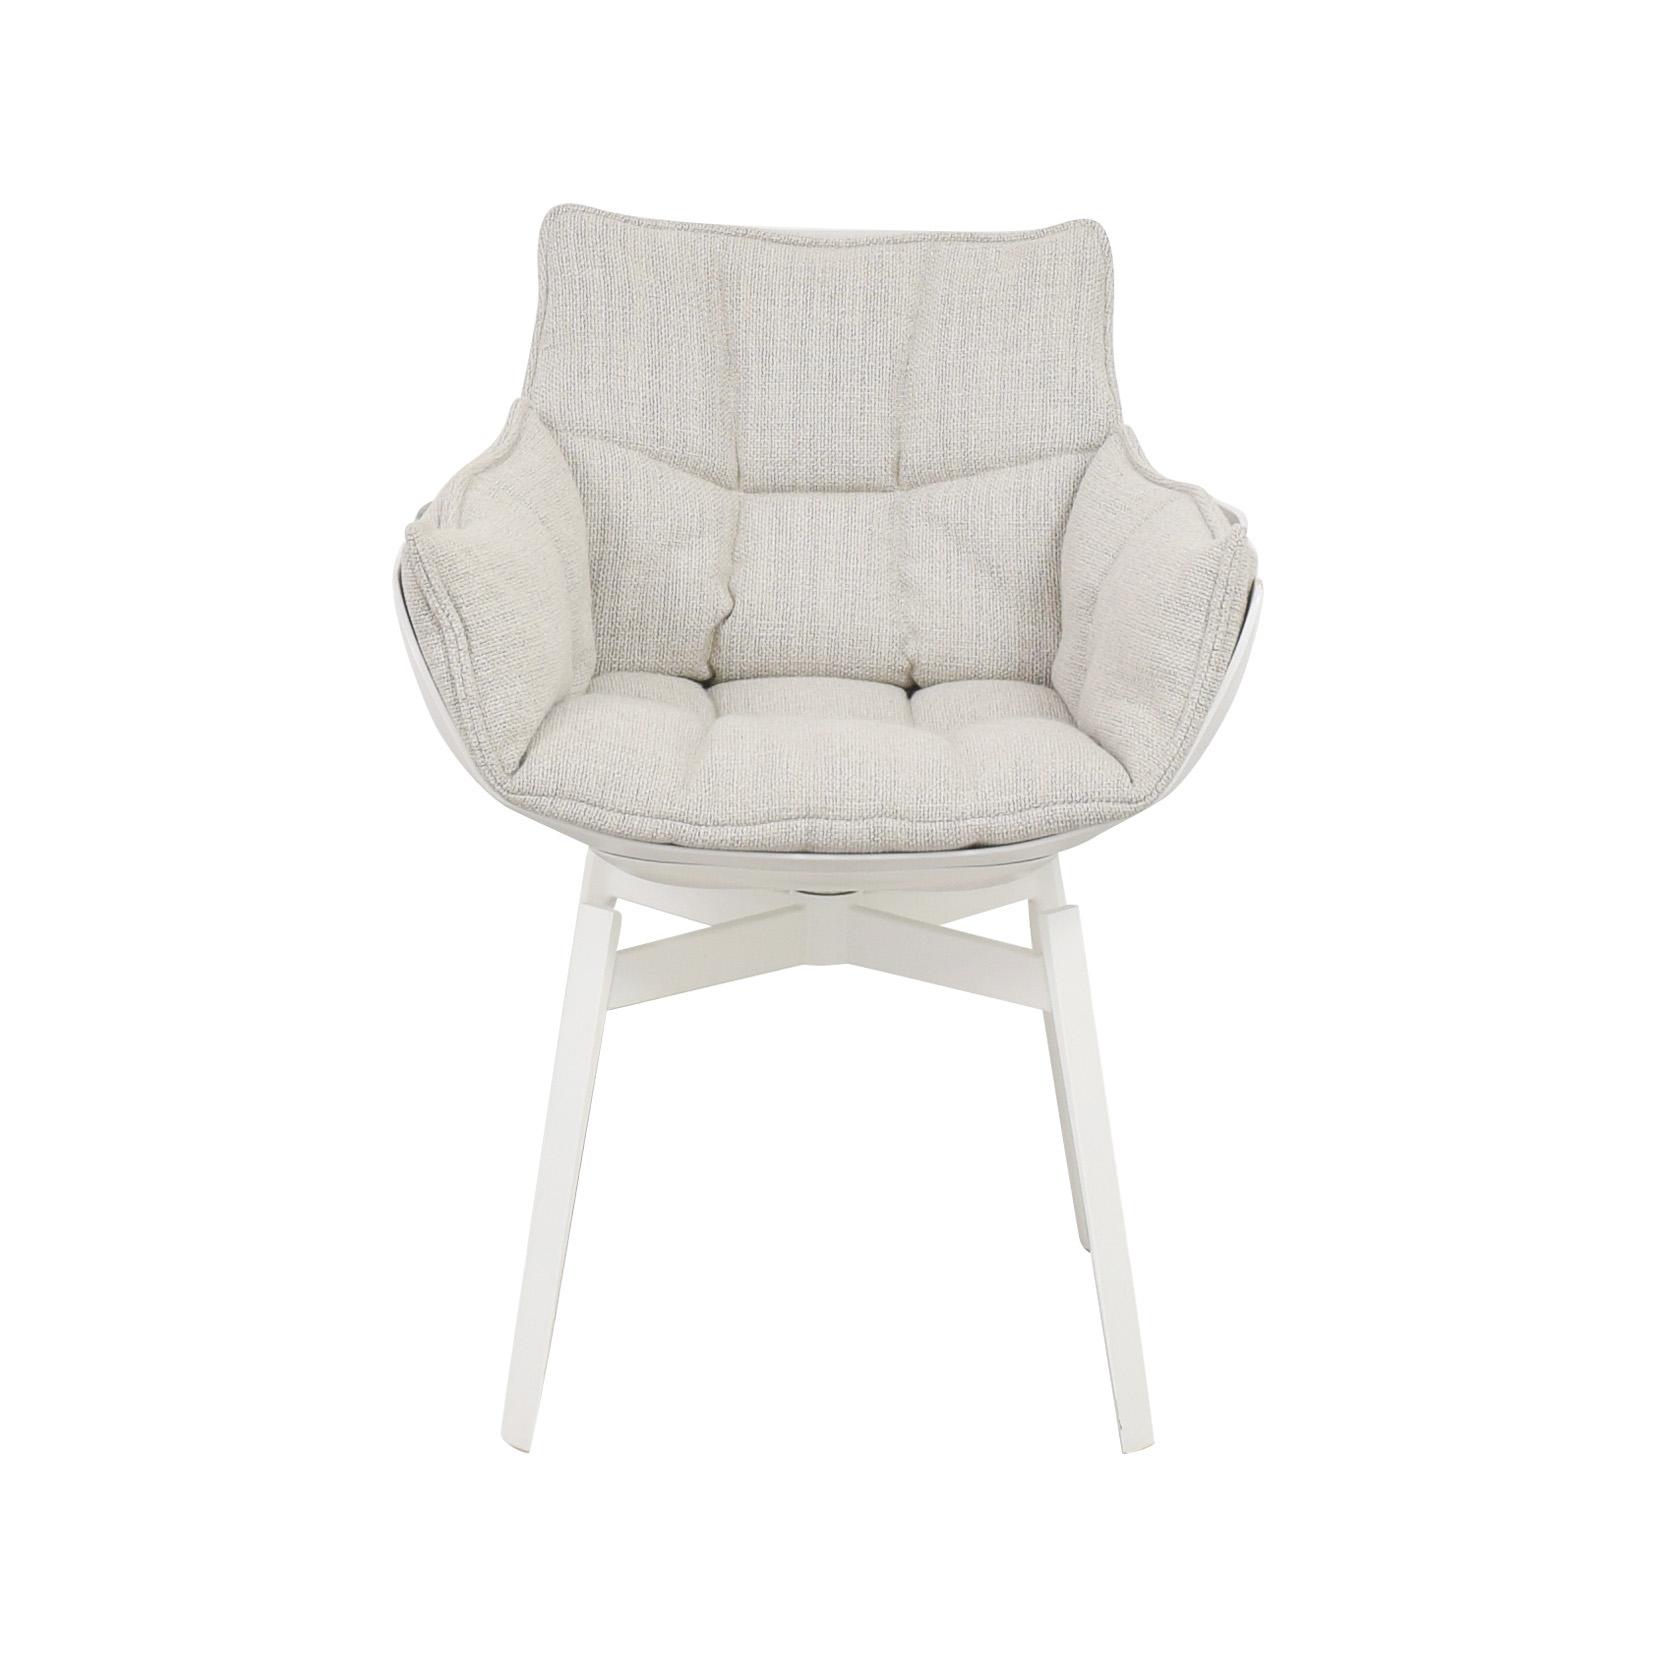 B&B Italia B&B Italia Husk Chair on sale